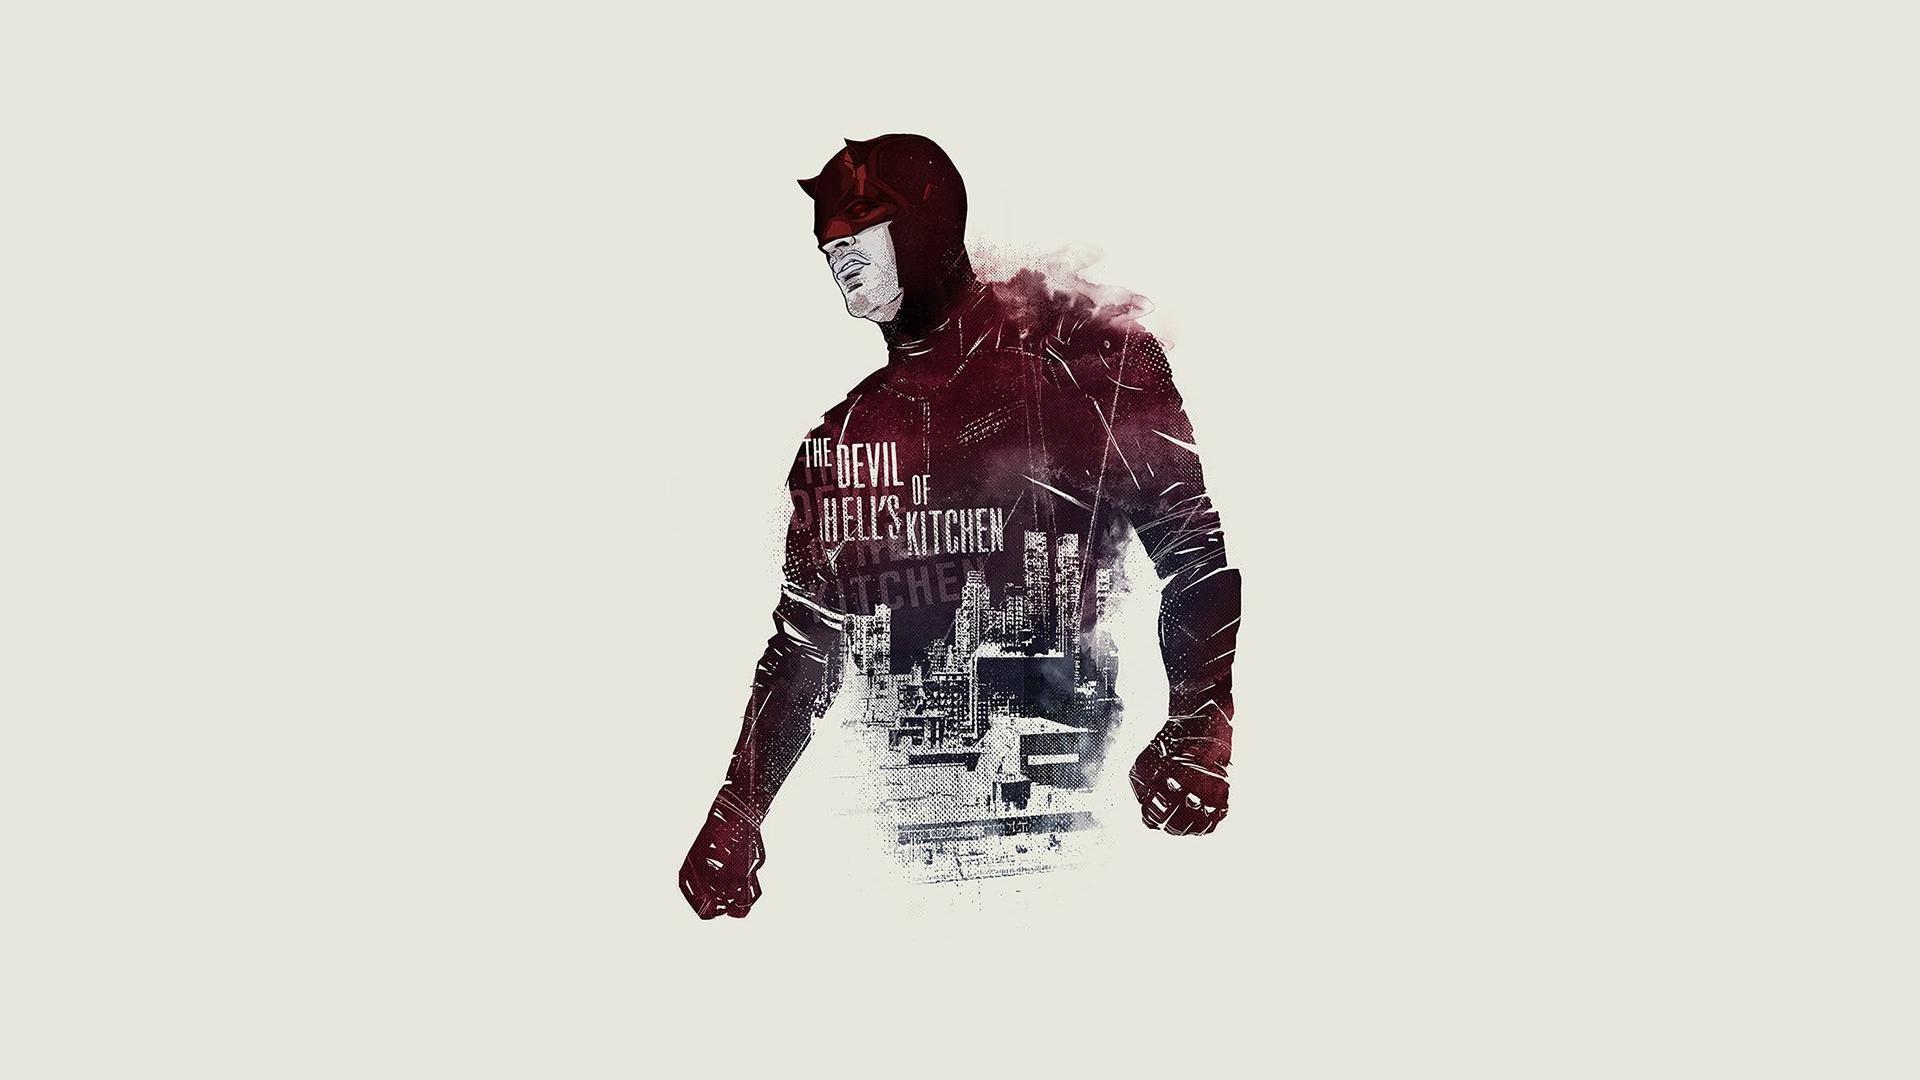 Daredevil-Wallpapers-HD-Free-Download